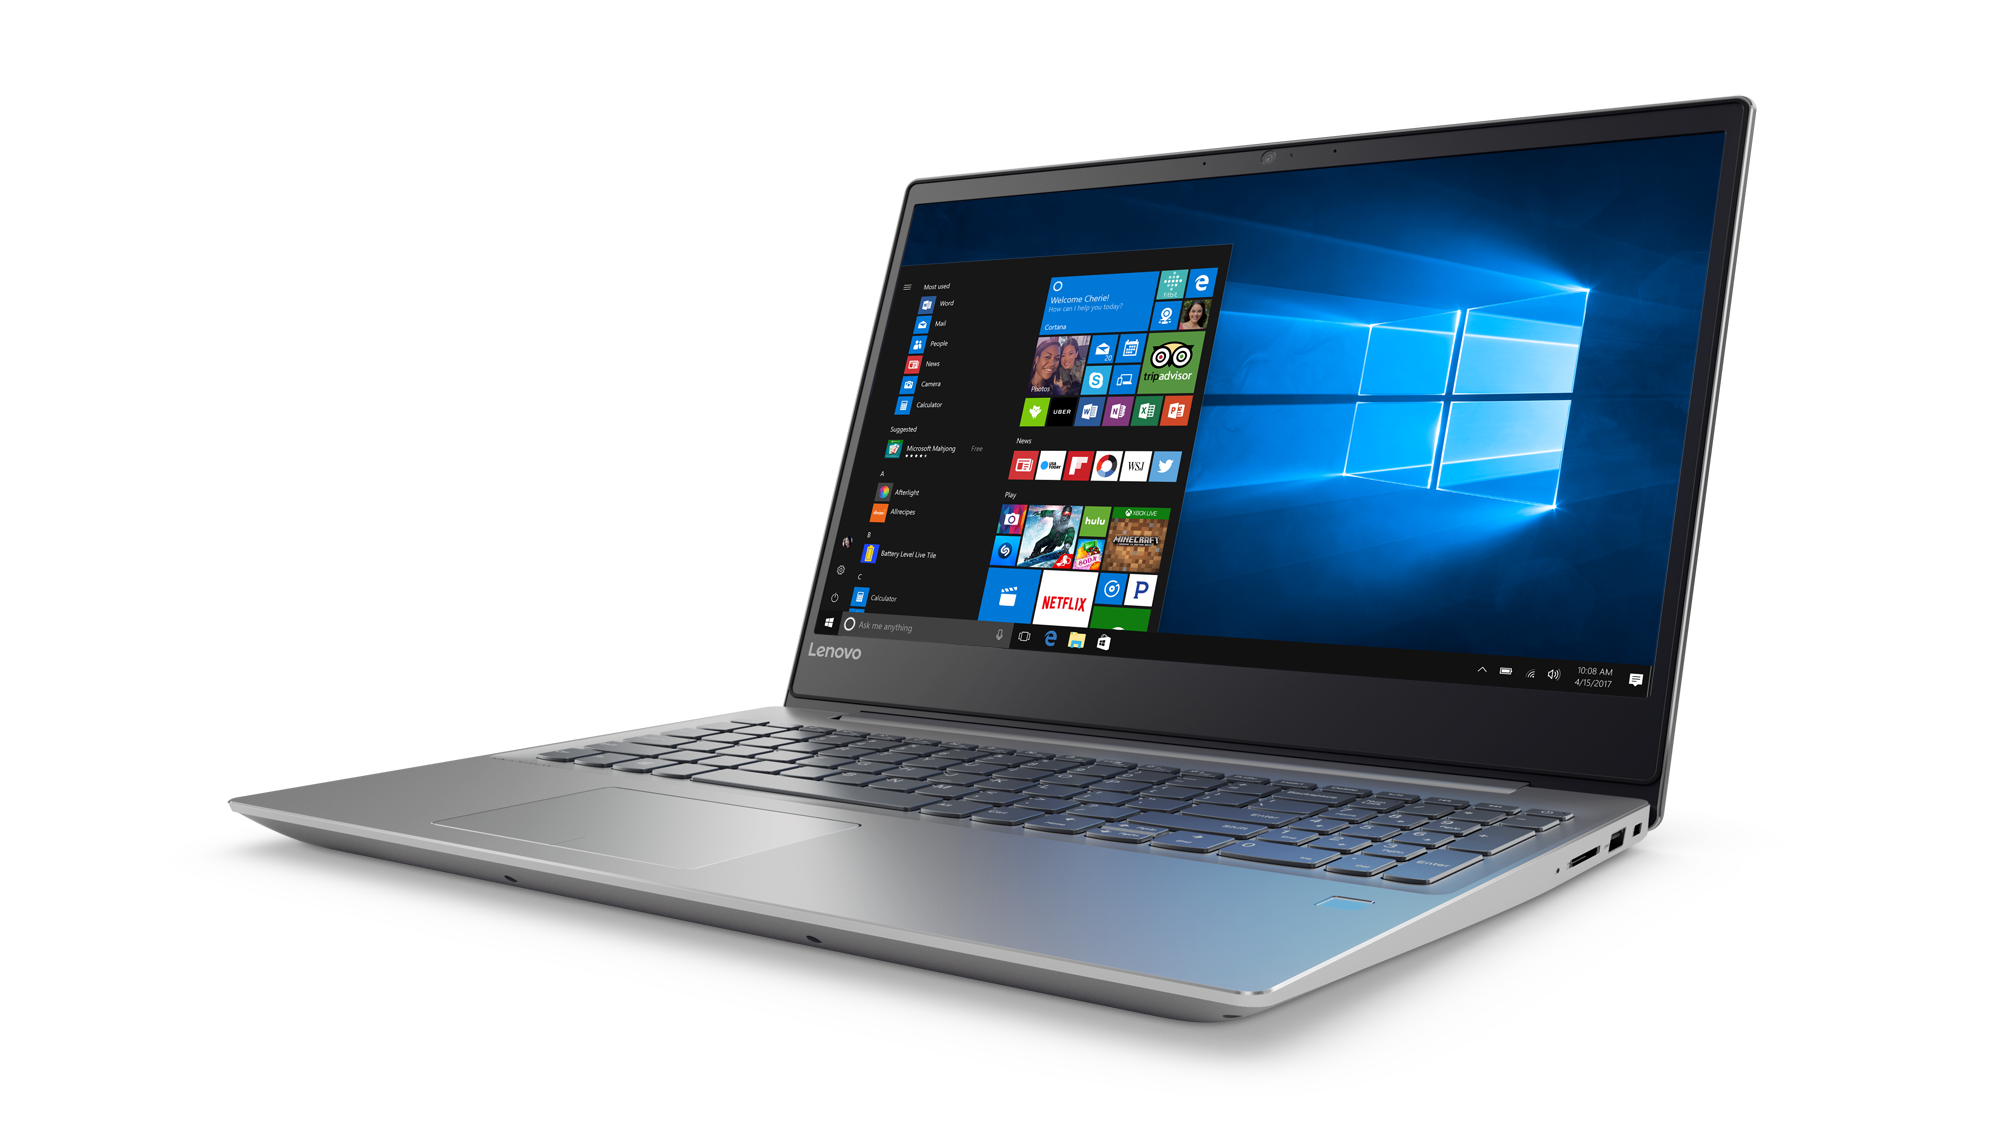 "Lenovo IdeaPad 720-15IKBR i7-8550U 4,00GHz/12GB/SSD 128GB+HDD 1TB/15,6"" FHD/IPS/AG/Radeon 4GB/FPR/WIN10 šedá"